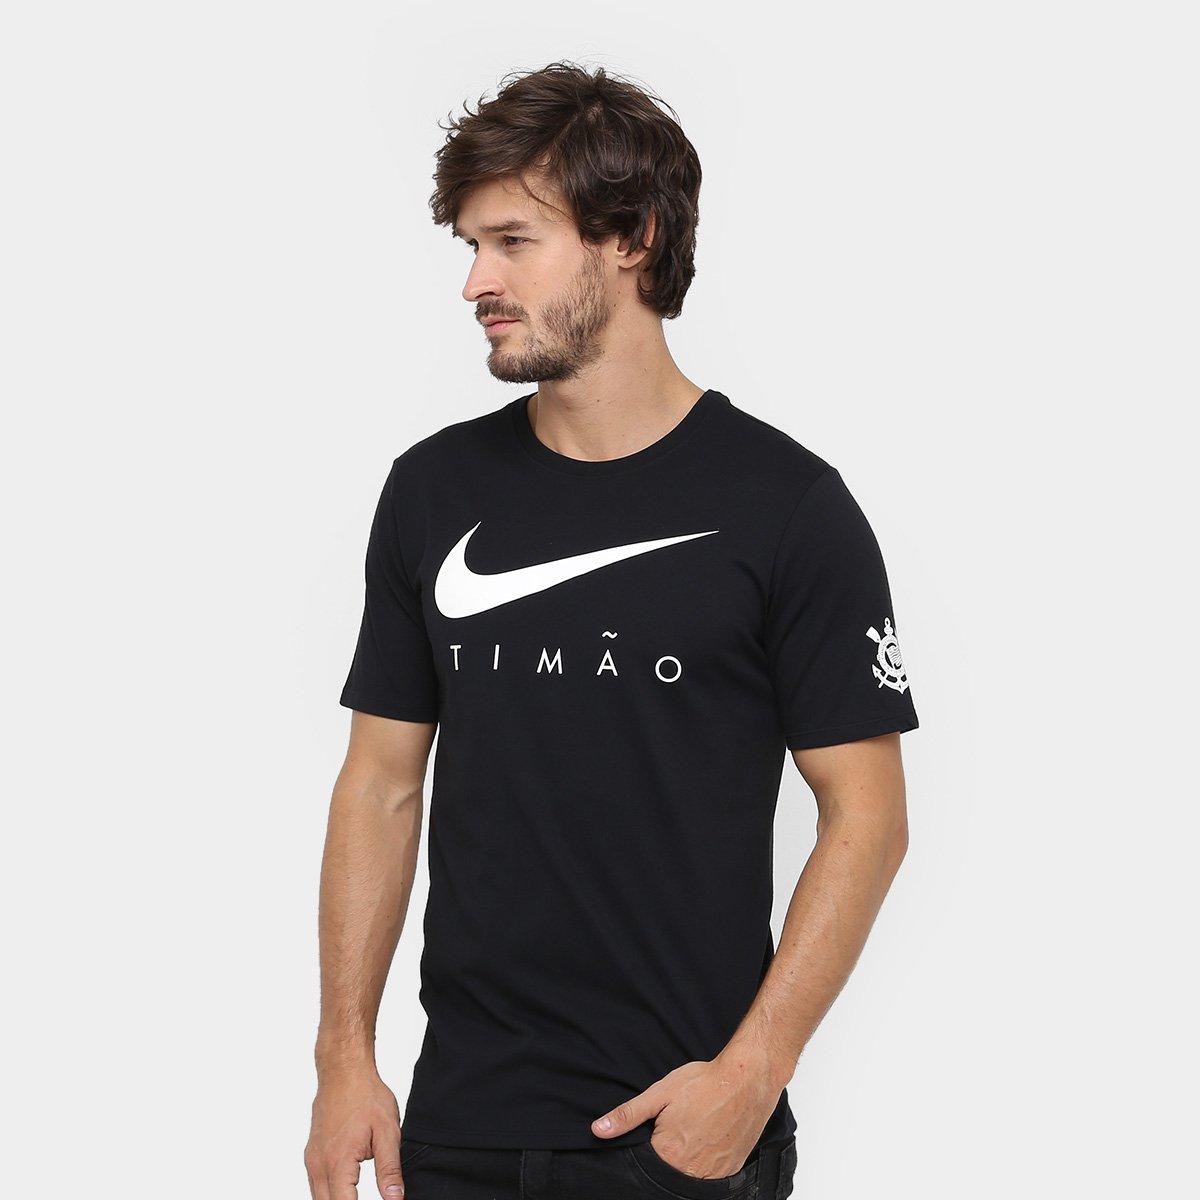 Camiseta Corinthians Nike Dry Pre-season Masculina - Compre Agora ... b40932ceae59e